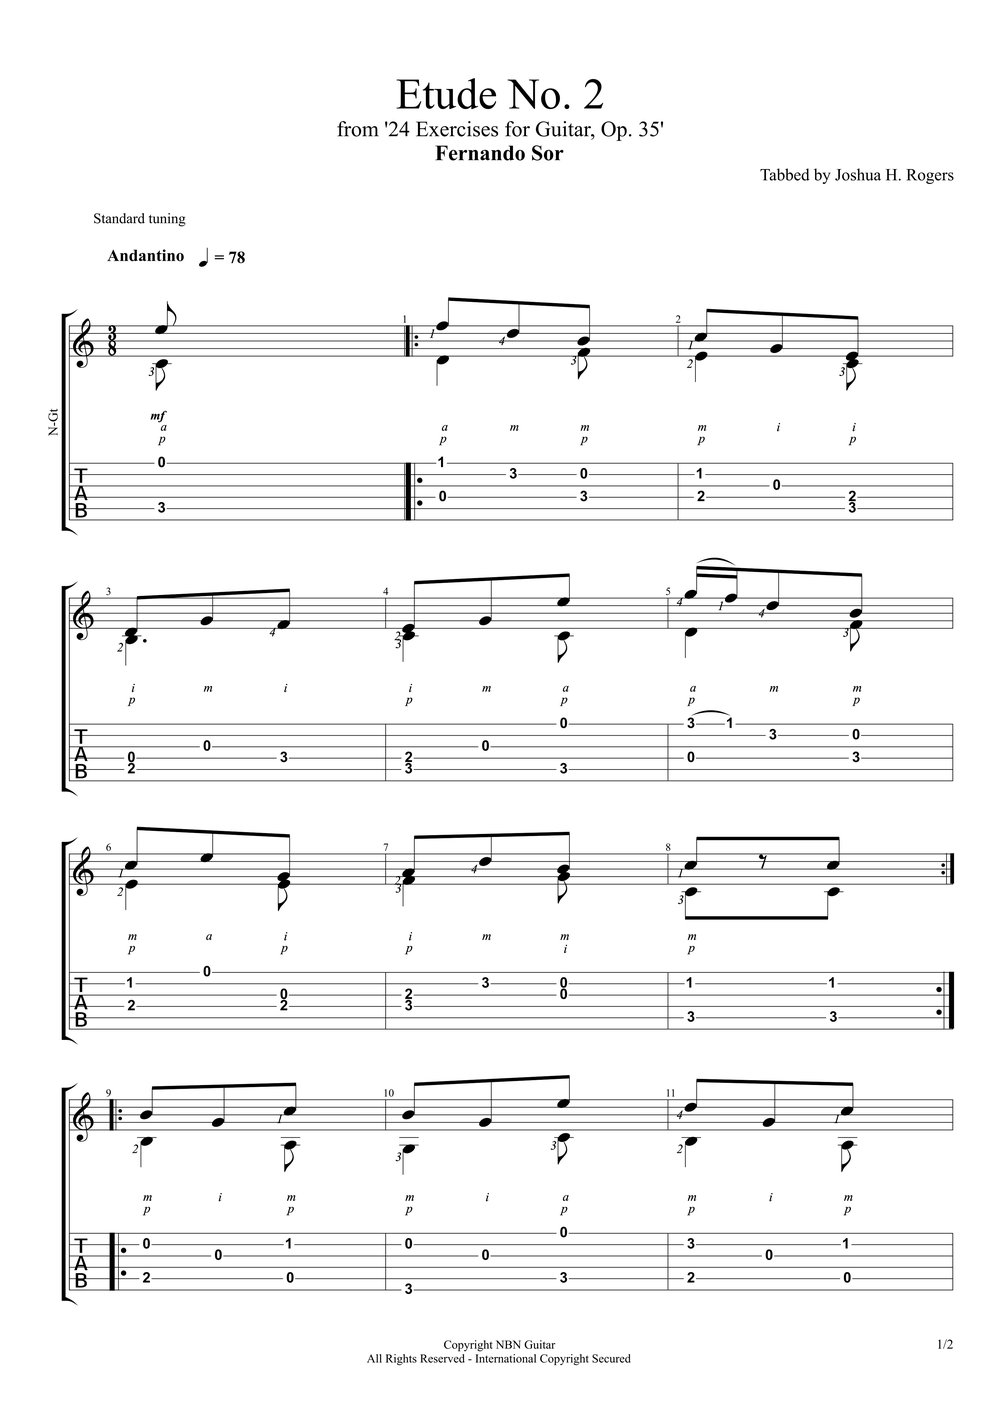 Etude No. 2, Op. 35 - Fernando Sor (Sheet Music & Tabs)-p3.jpg